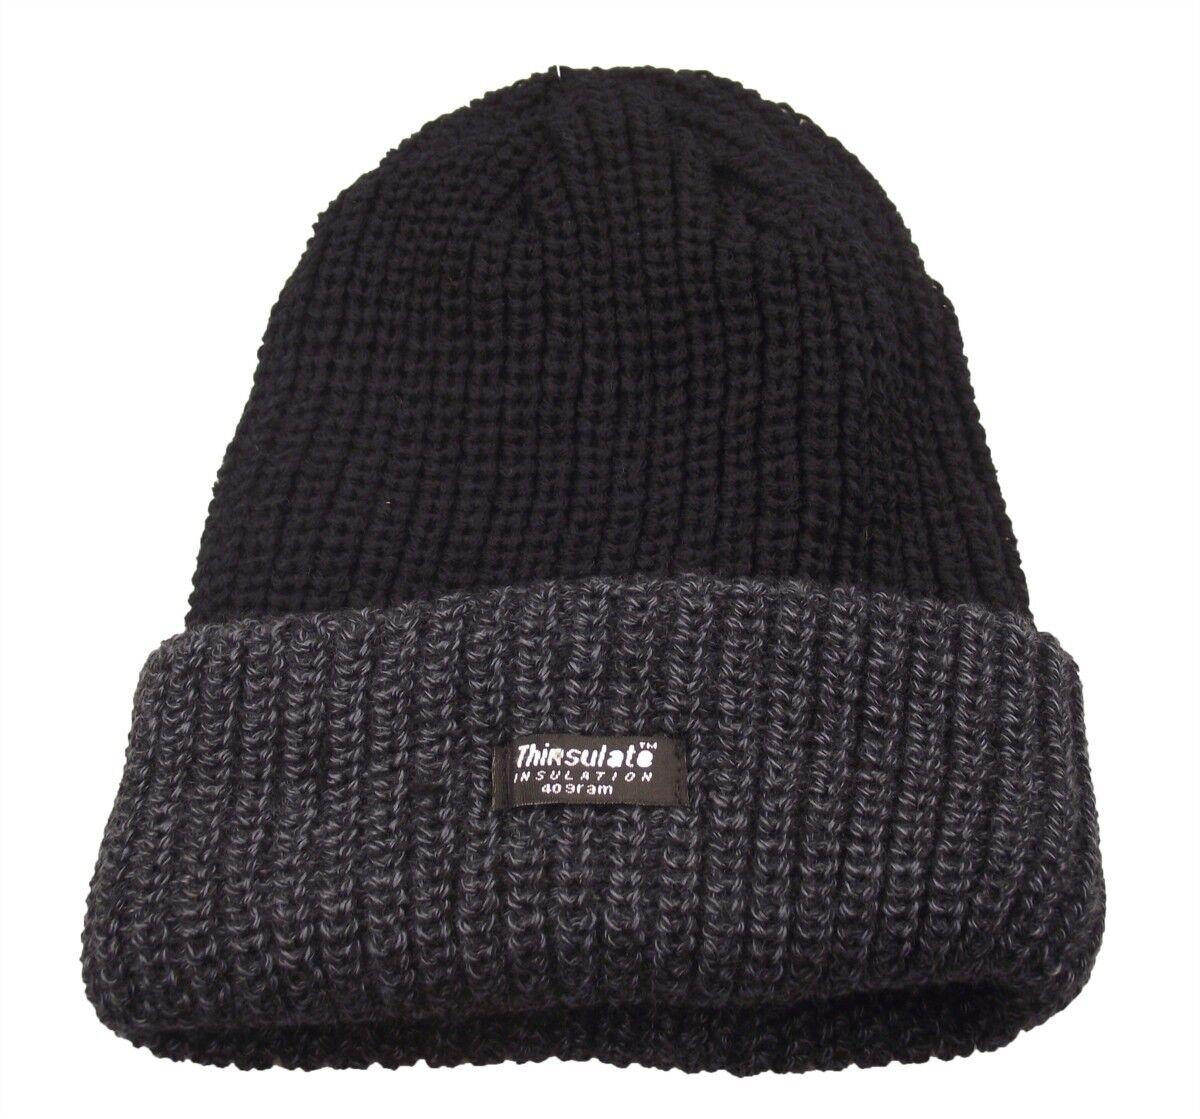 28ac7e83aa9 Mens Grey black Beanie Hat Chunky Knit Fleece Lined 3m Thinsulate ...